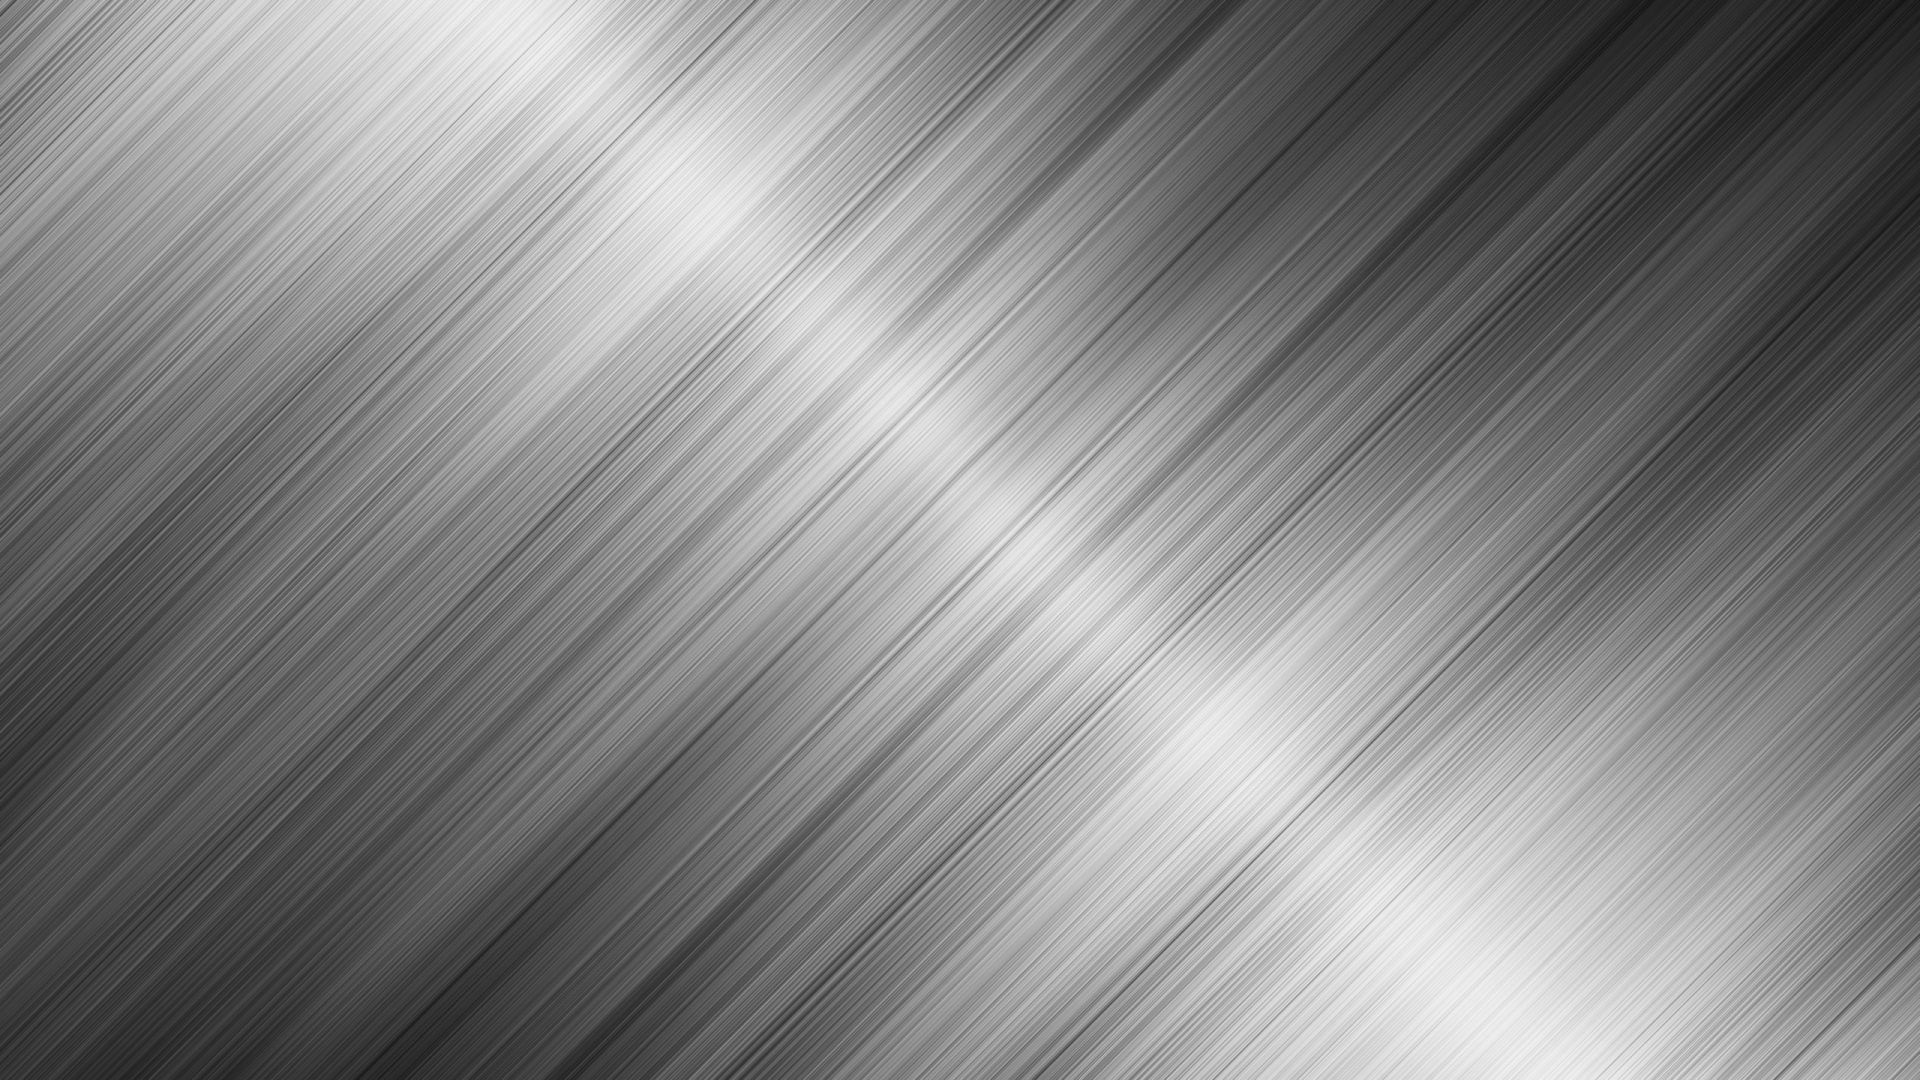 Wallpaper Metal Hd